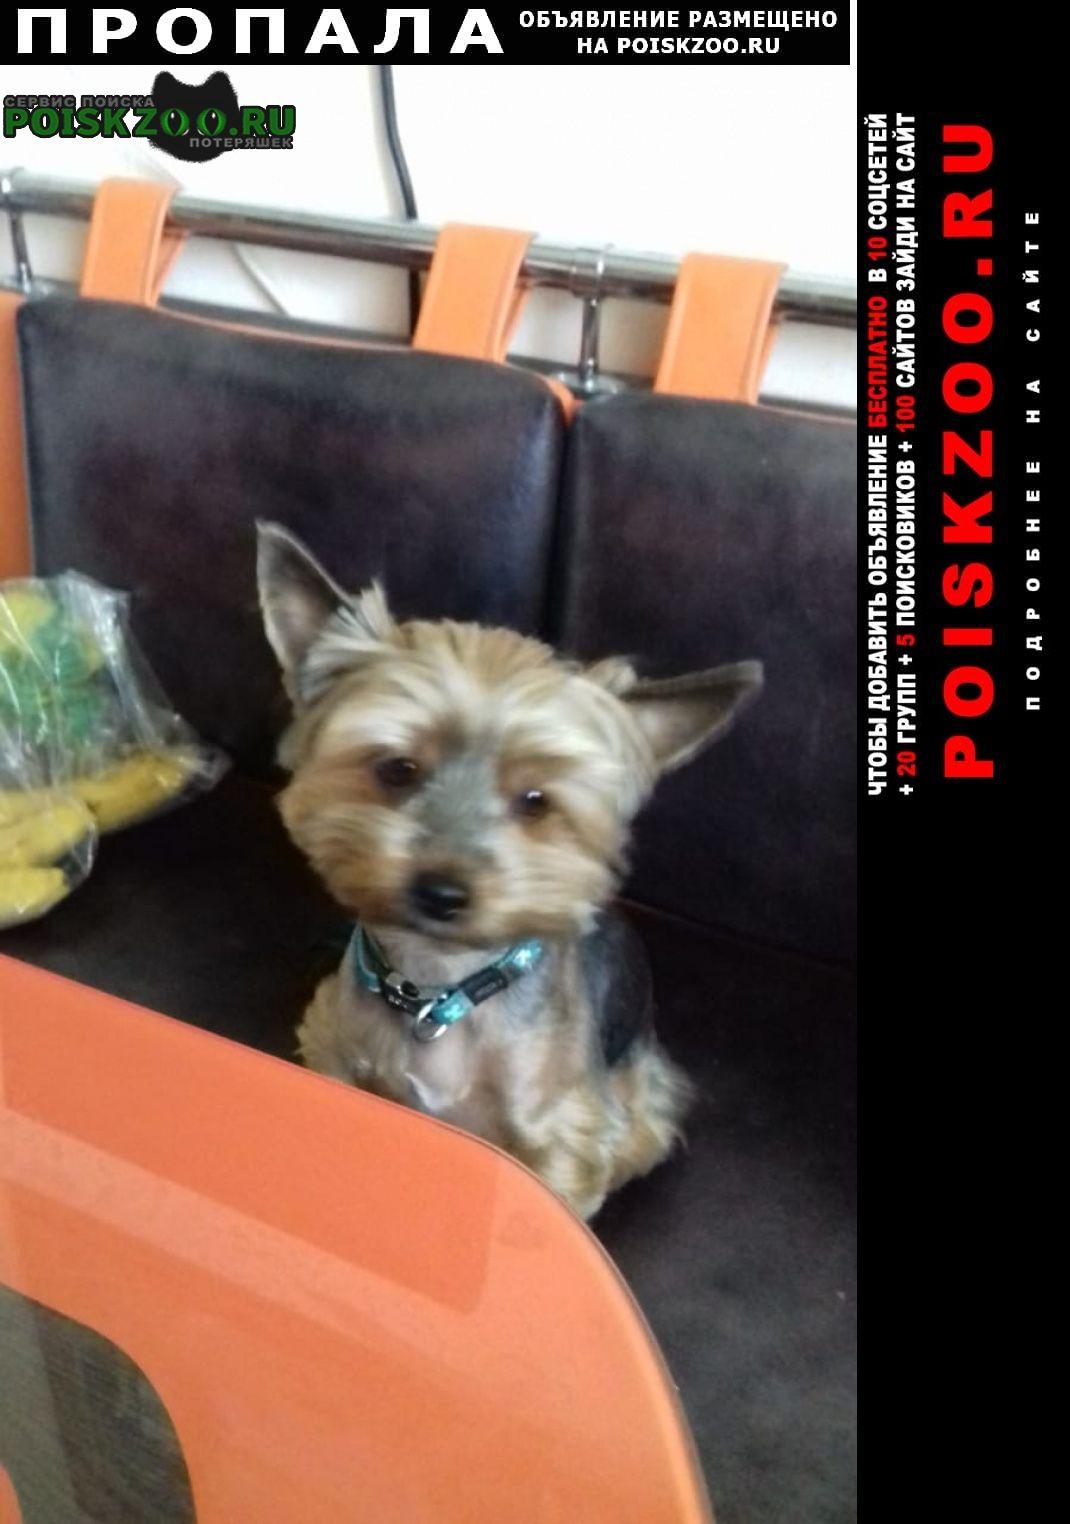 Пропала собака йорк Москва